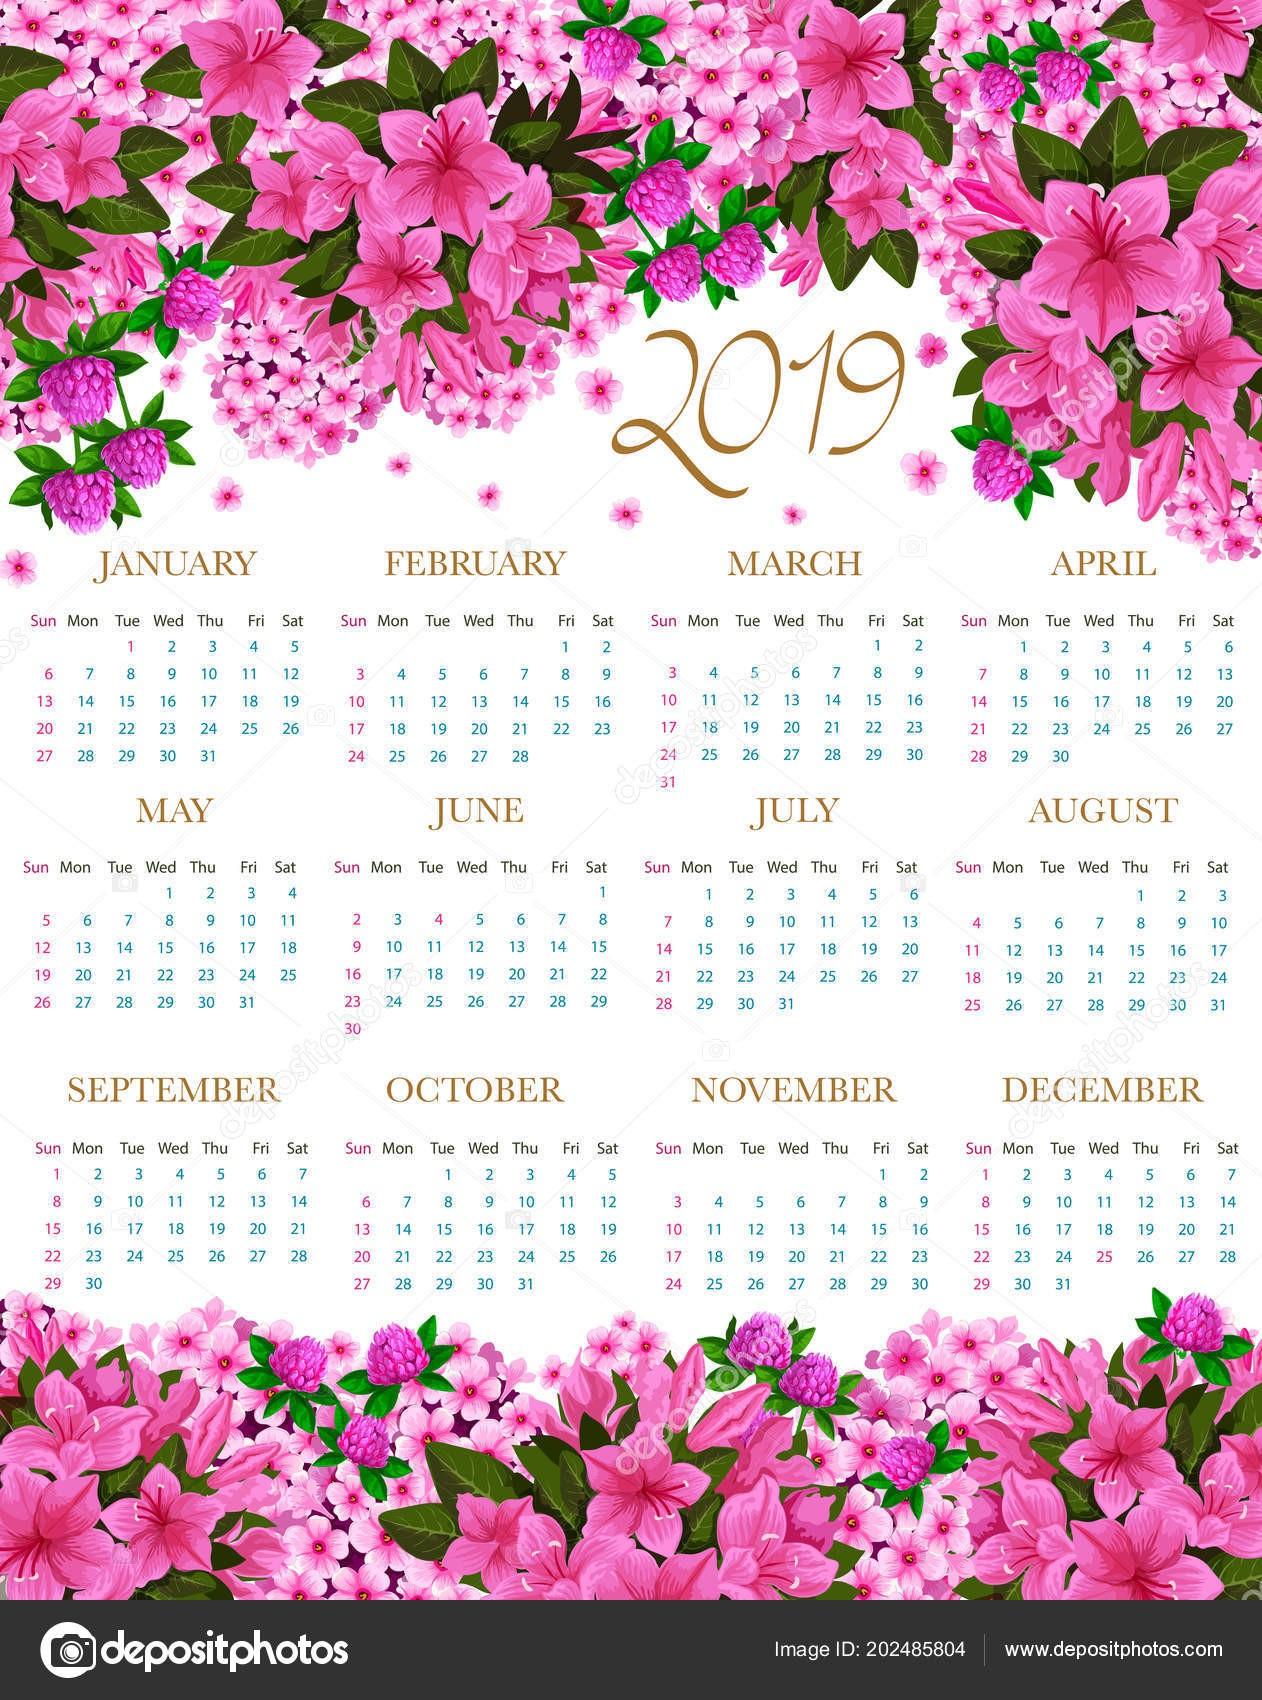 Calendario 2019 Vector Recientes 2019 Vektor Kalendář Jarn Růžové Květiny — Stock Vektor Of Calendario 2019 Vector Más Recientes Septiembre 2019 Nástěnné Kalendáře Å¡panělÅ¡tina — Stock Vektor